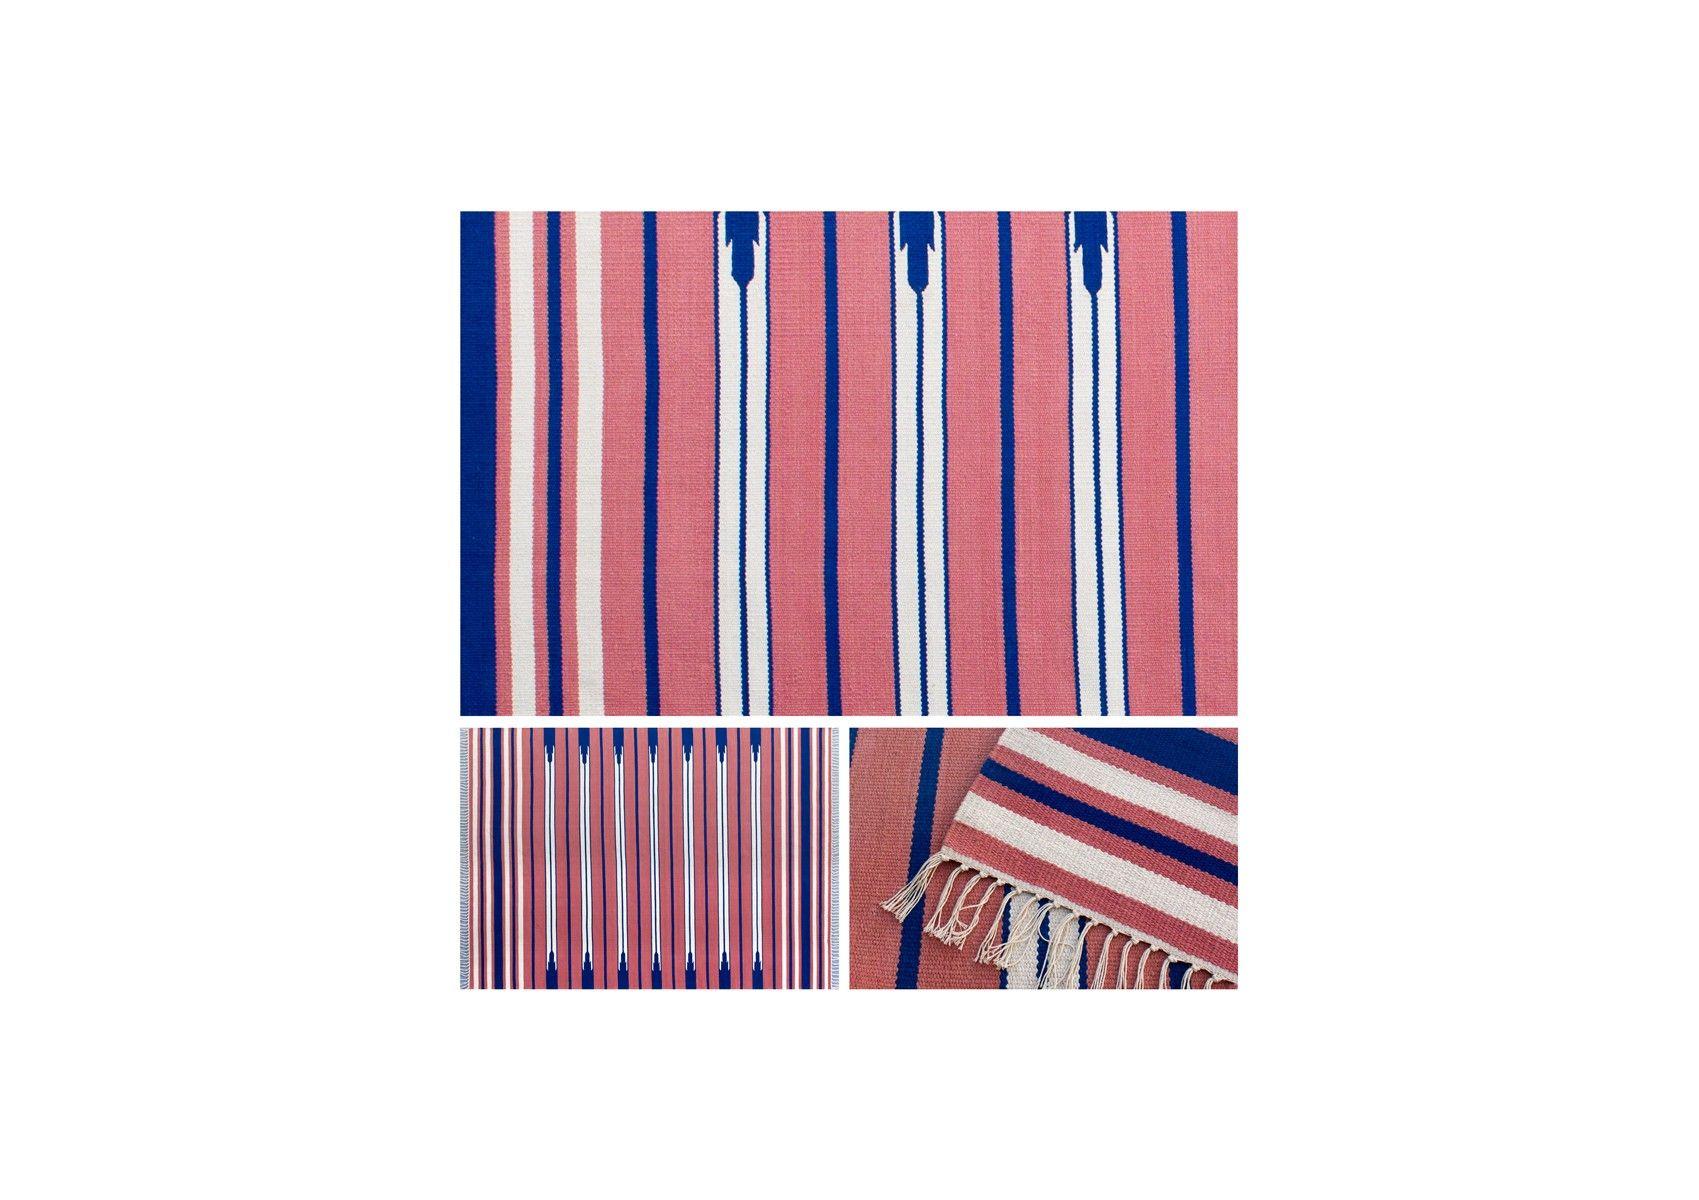 Navaho Stripes - 100% bomuldstæppe, udført i terracotta, marineblå og hvid, håndvævet med frynser. Vendbart. Etnisk i stilen.